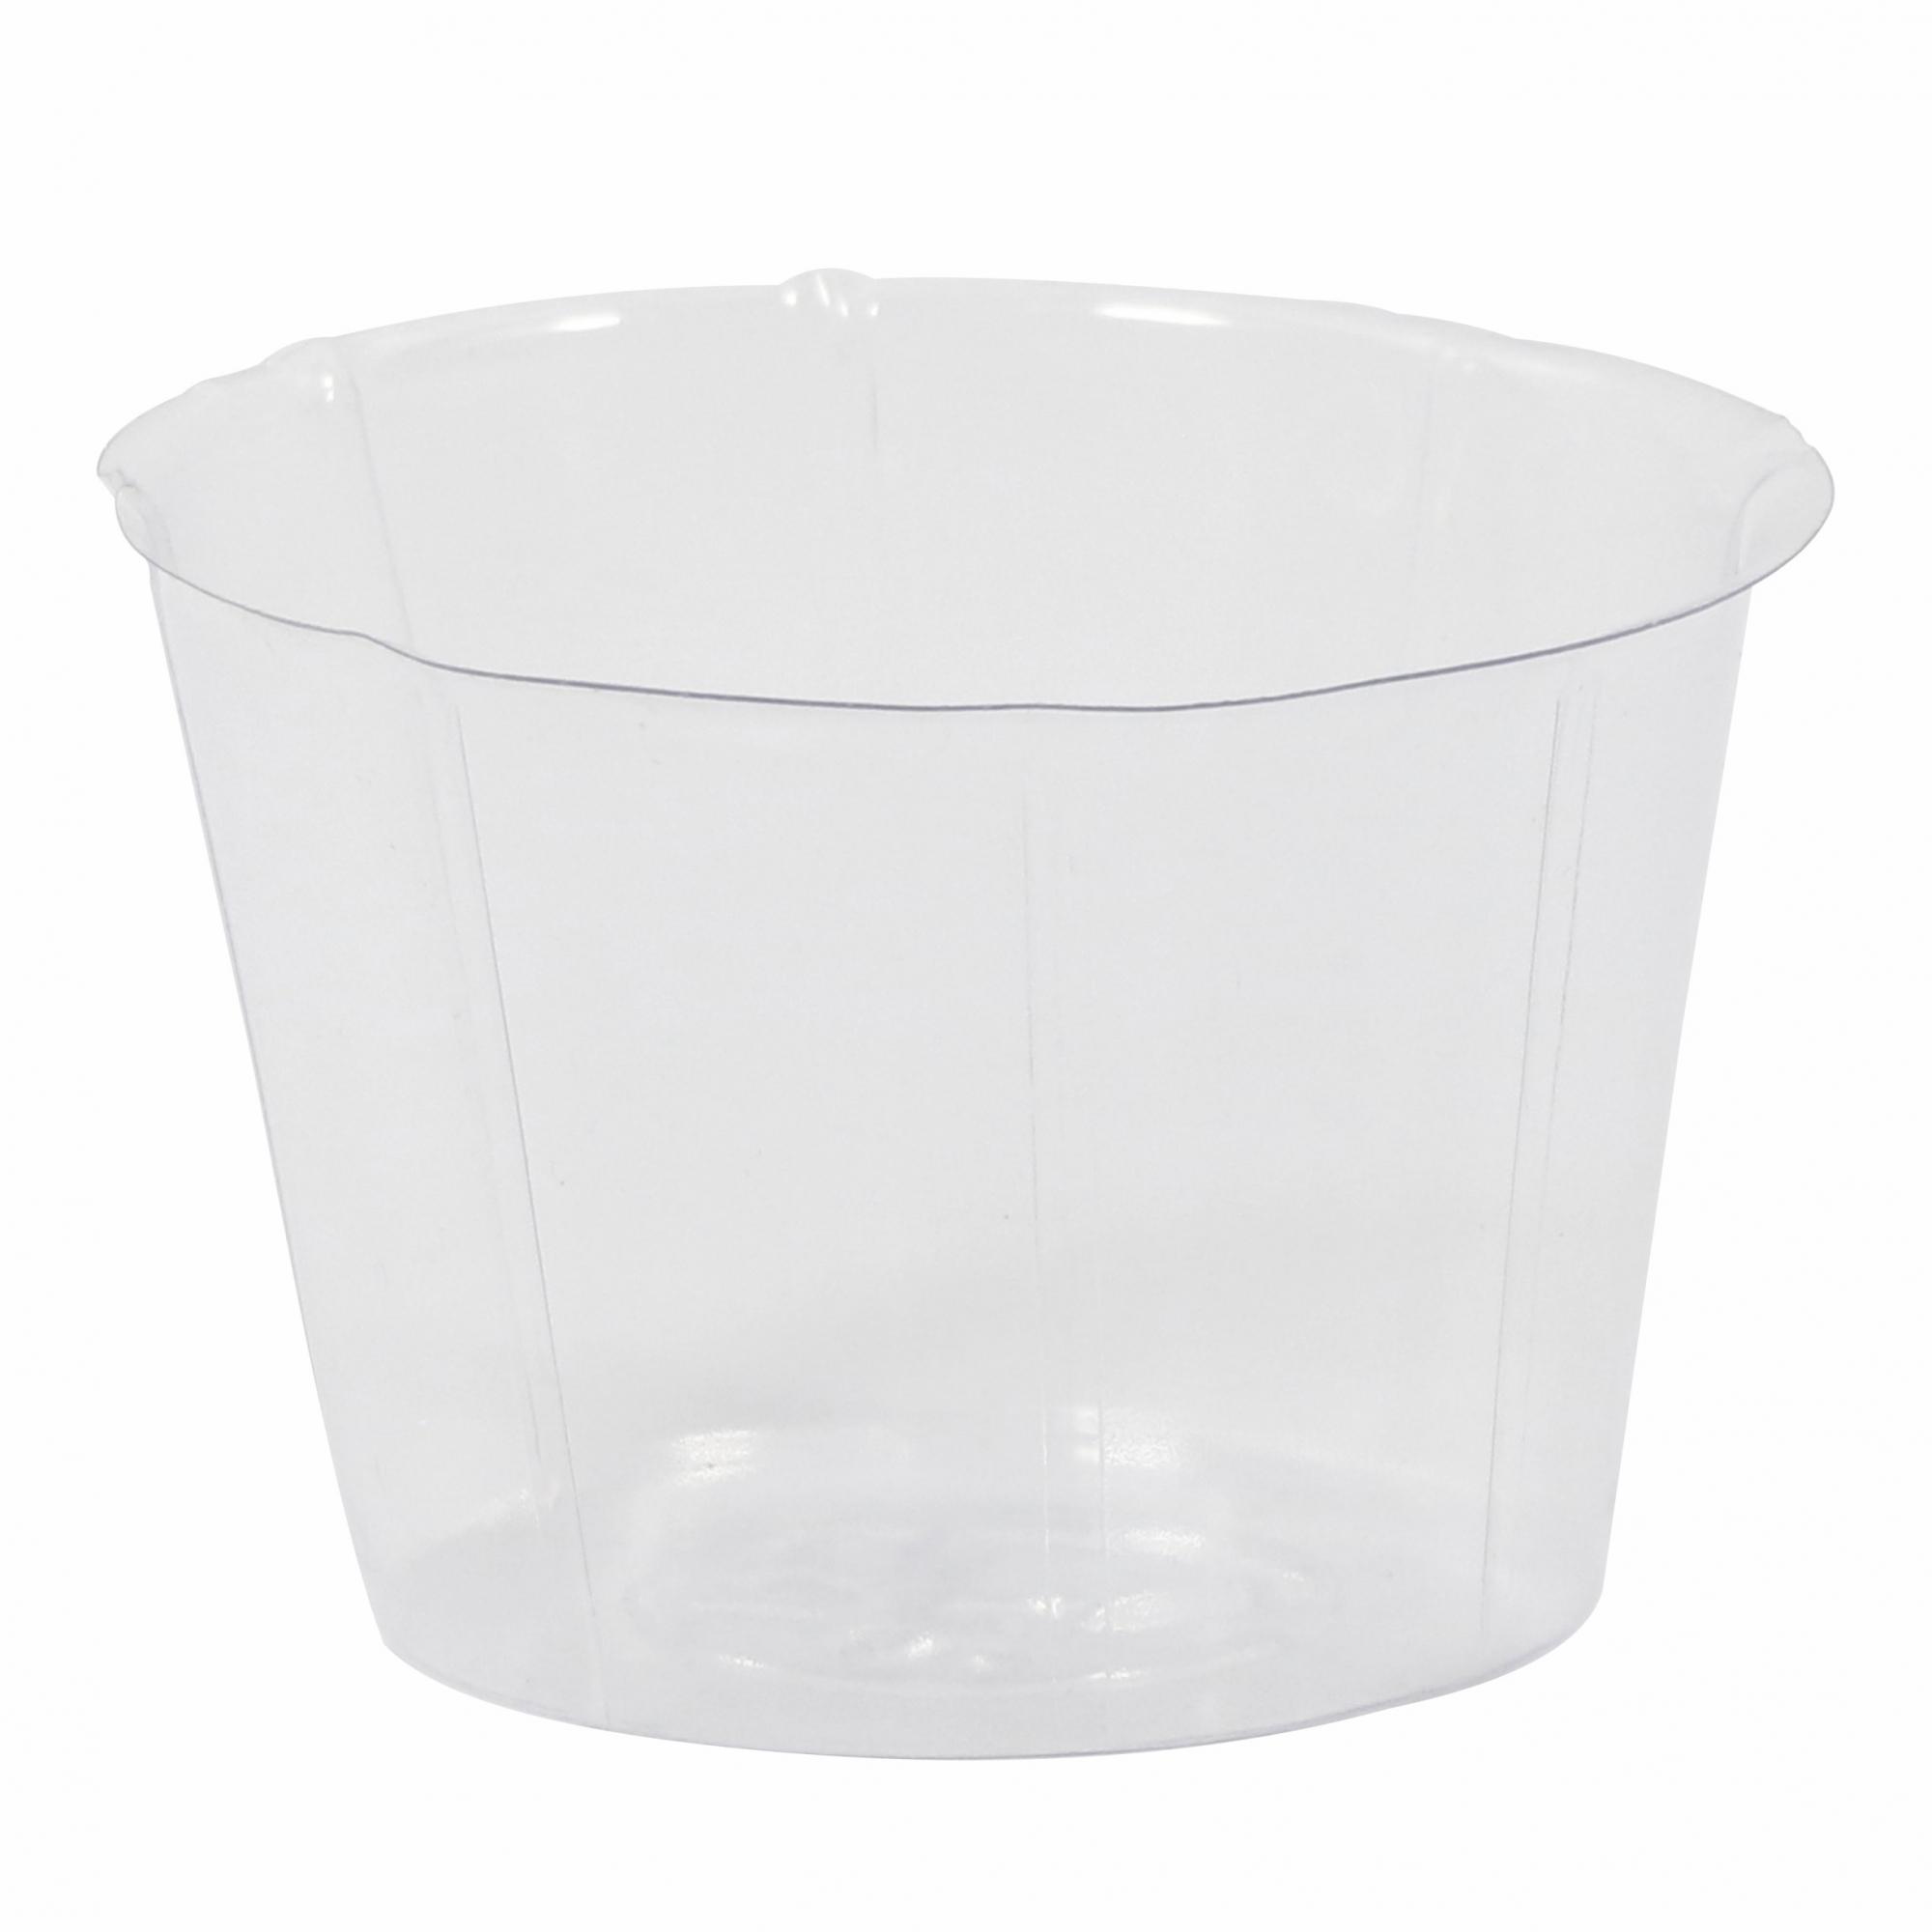 Cachepot de Plástico Transparente Inlay 15x10cm